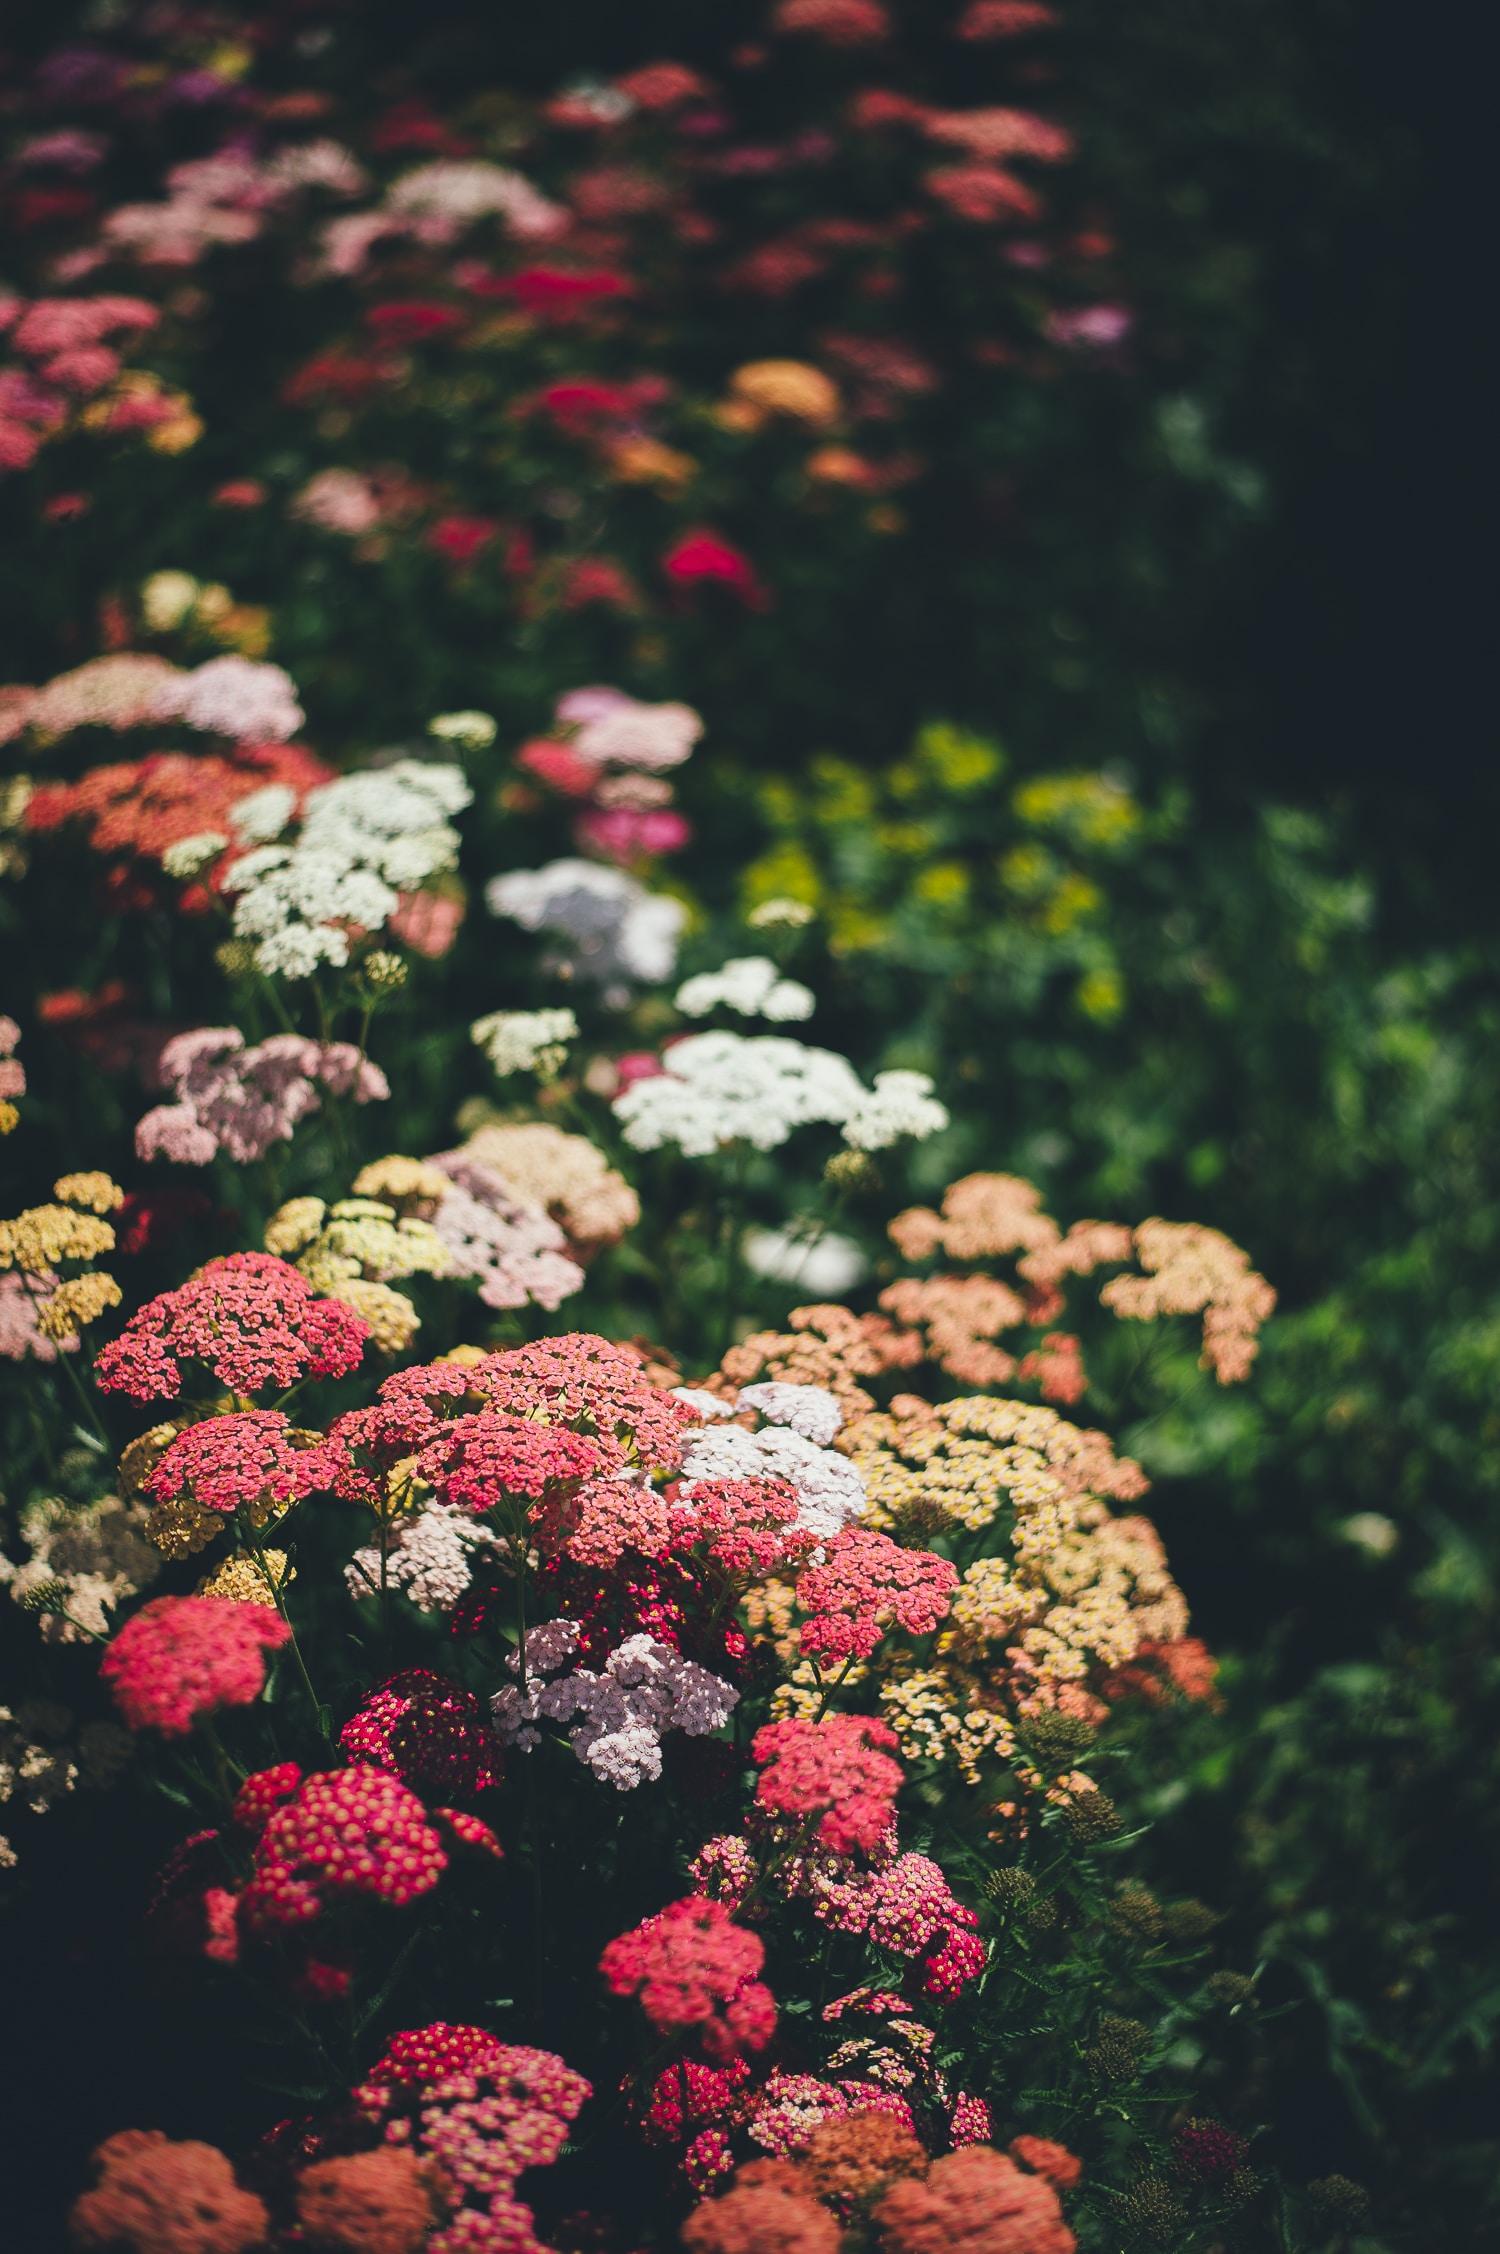 selective focus photography plantana flowers